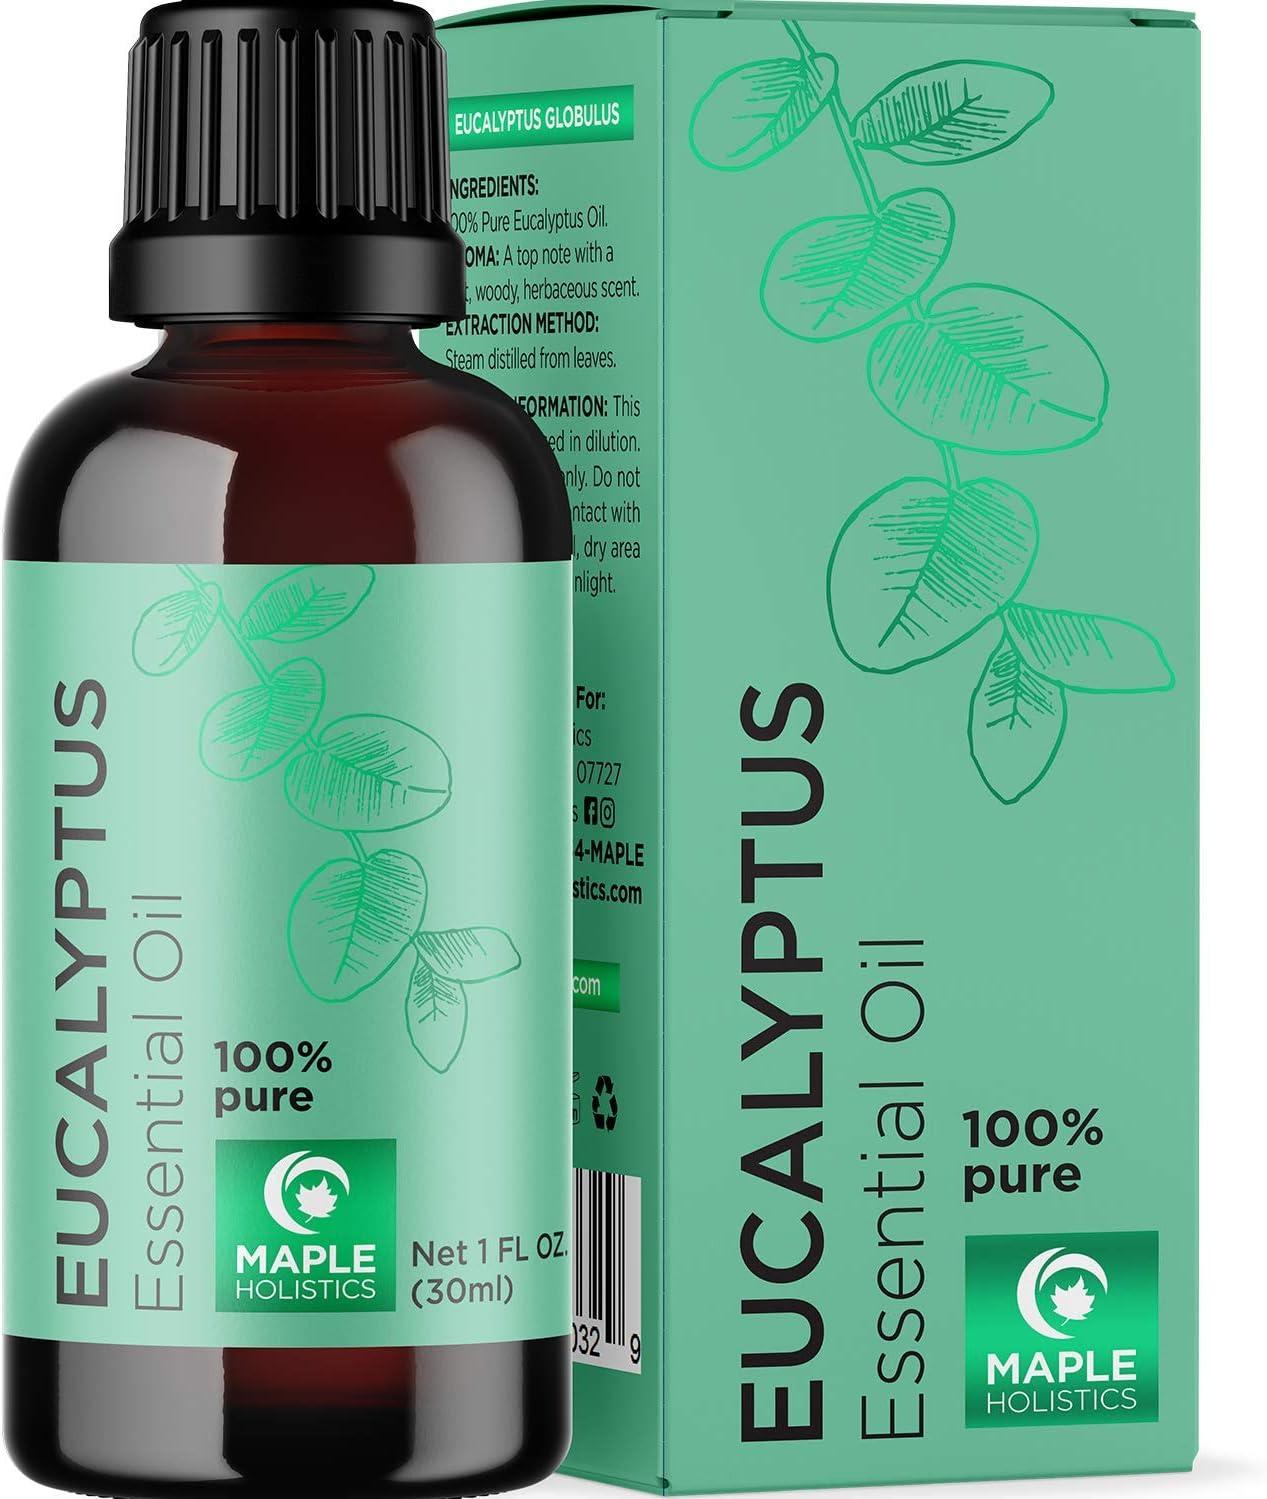 Maple Holitics Eucalyptus Essential Oil for Congestion